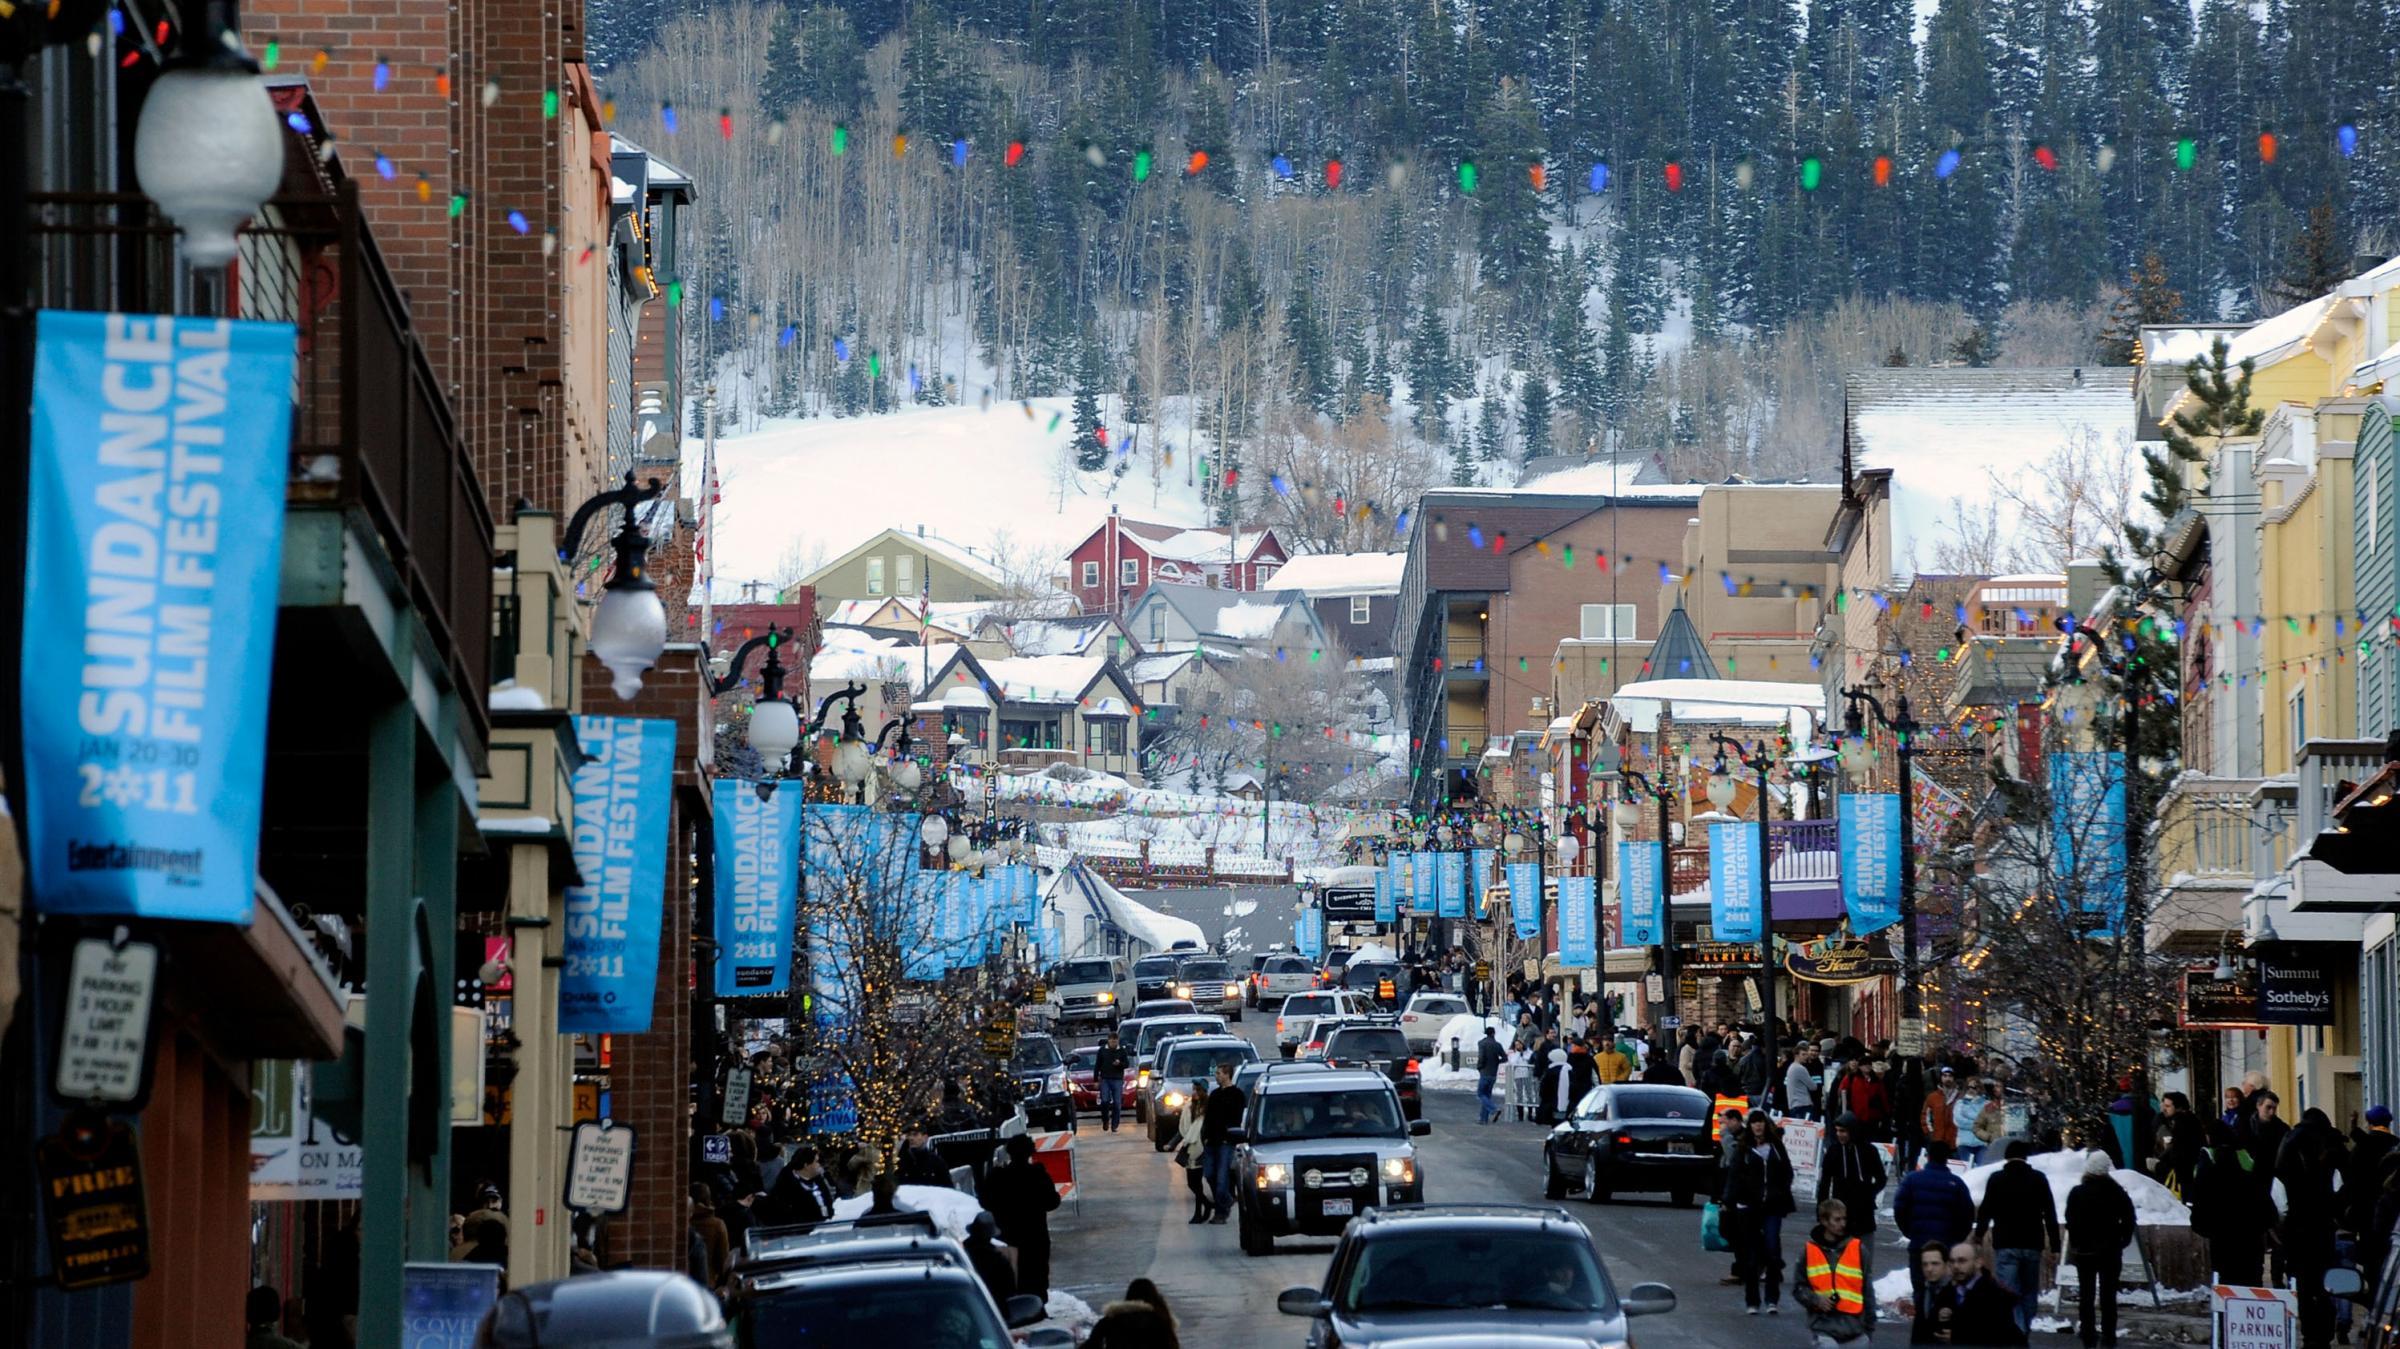 Sundance subsidy stirs conservative pushback kcur for Sundance house